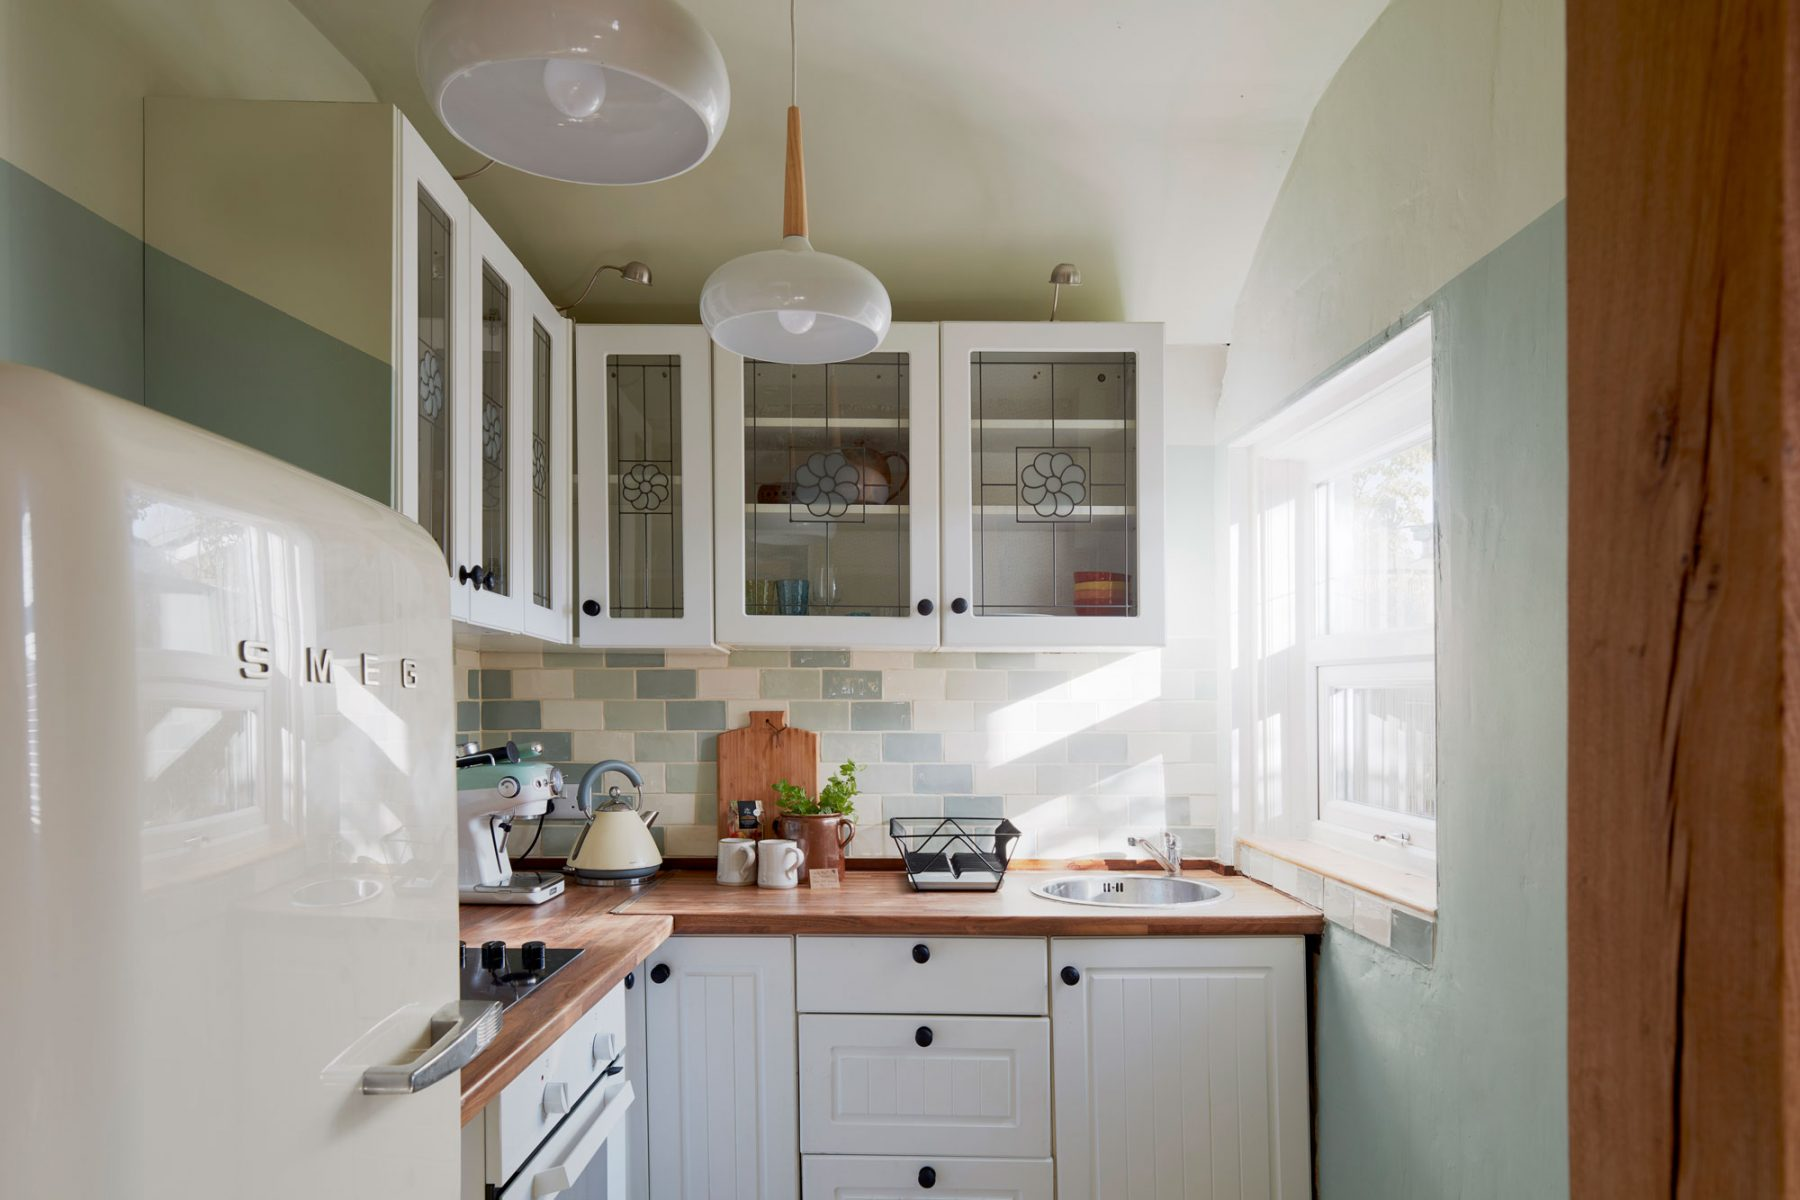 interiors_slider_2